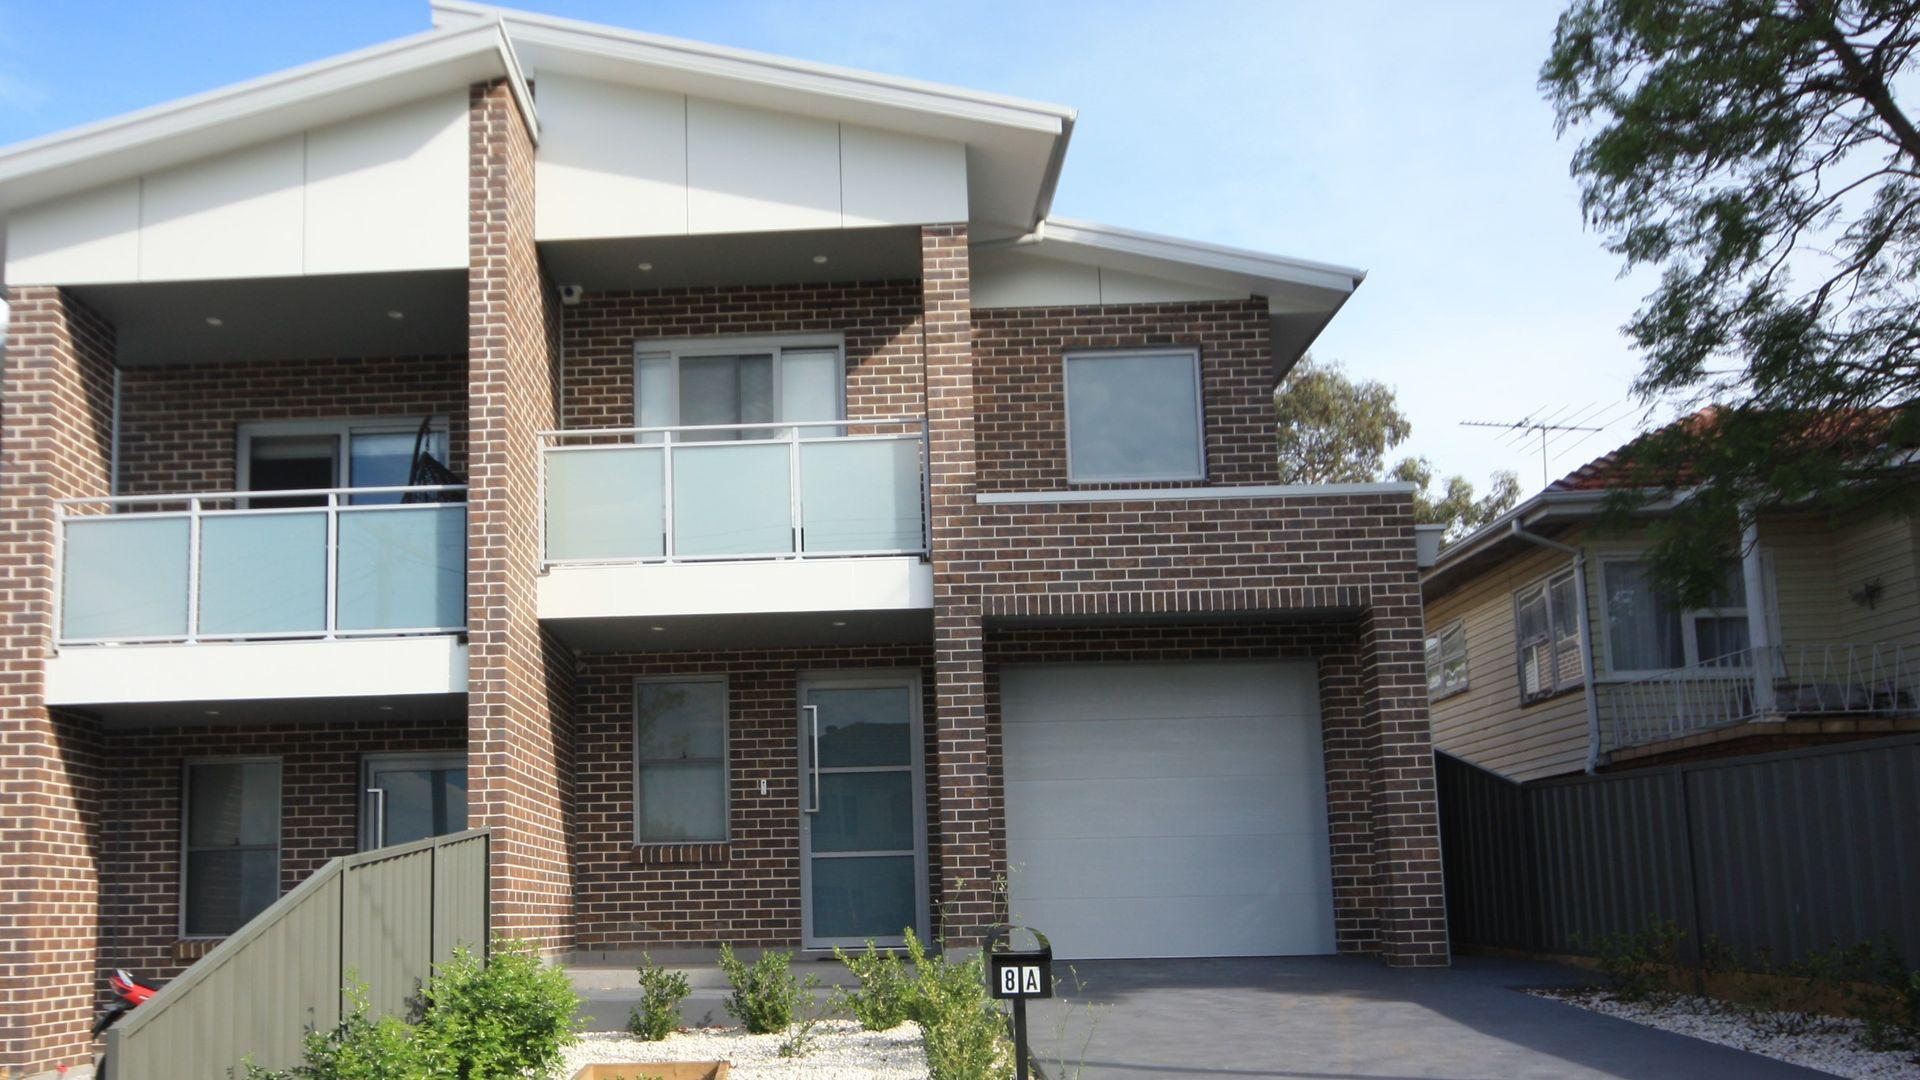 8A Hilltop Crescent, Campbelltown NSW 2560, Image 1